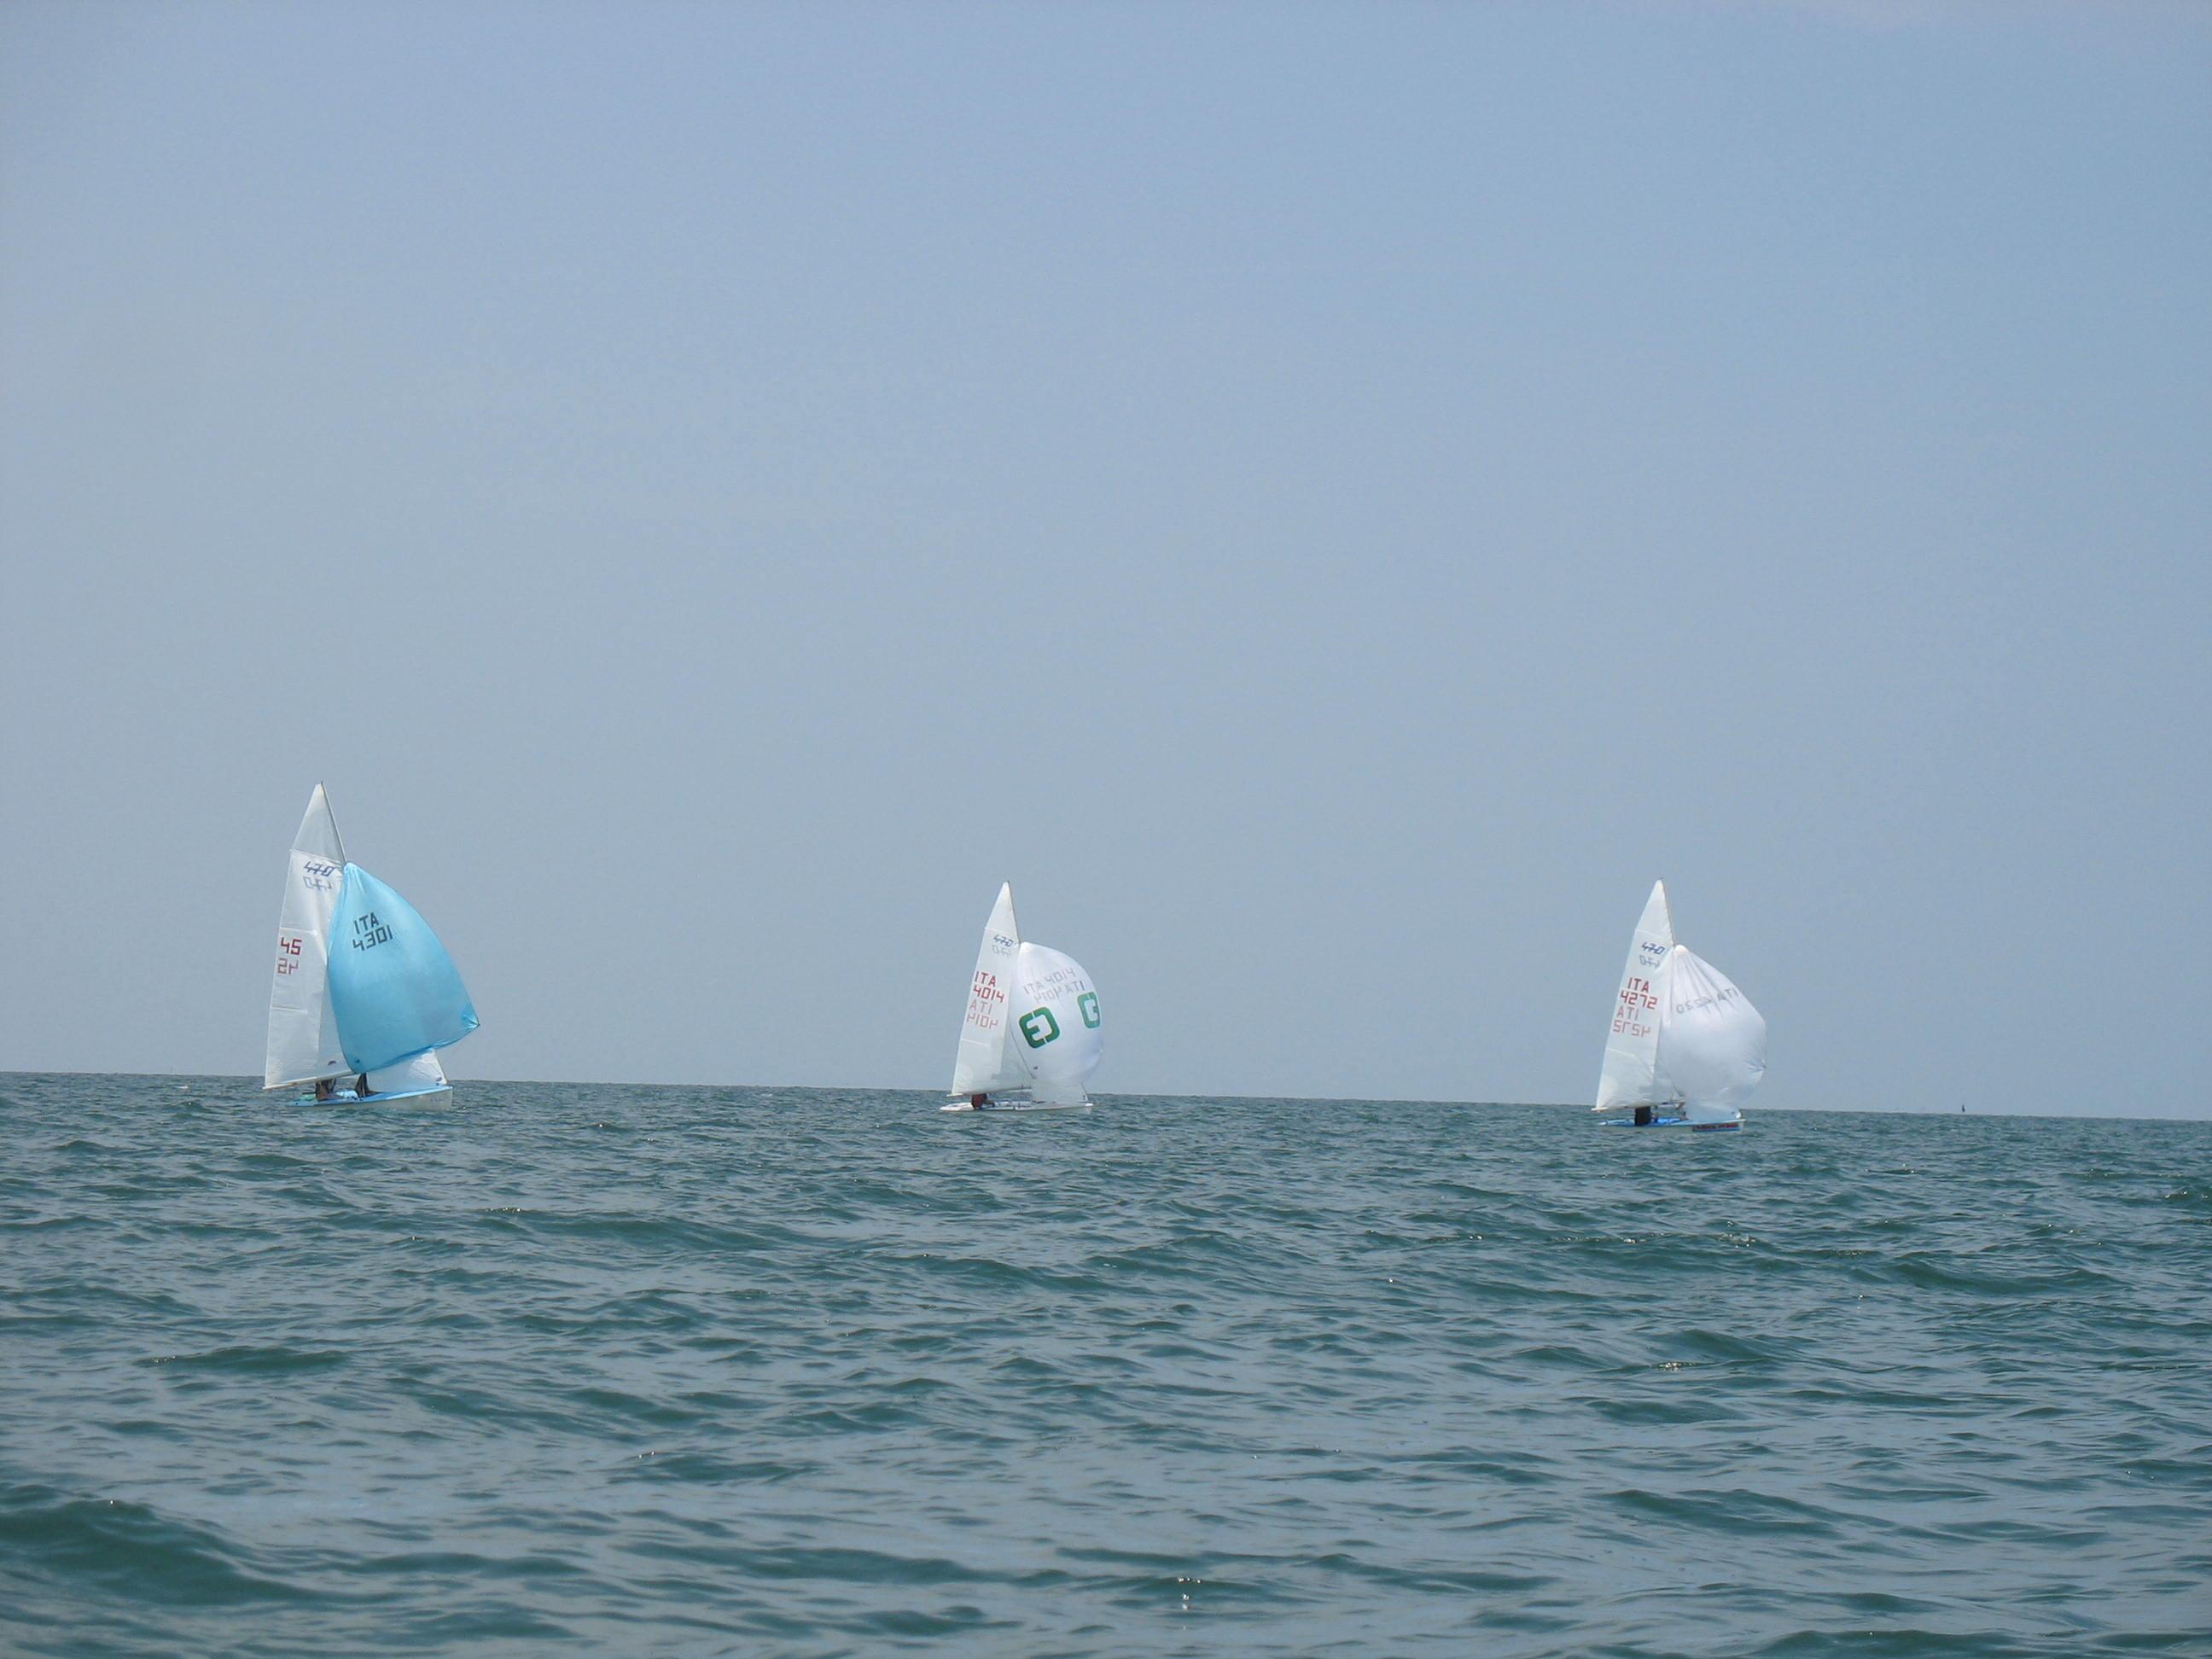 5-torneo-elia-tonelli-27062010-031